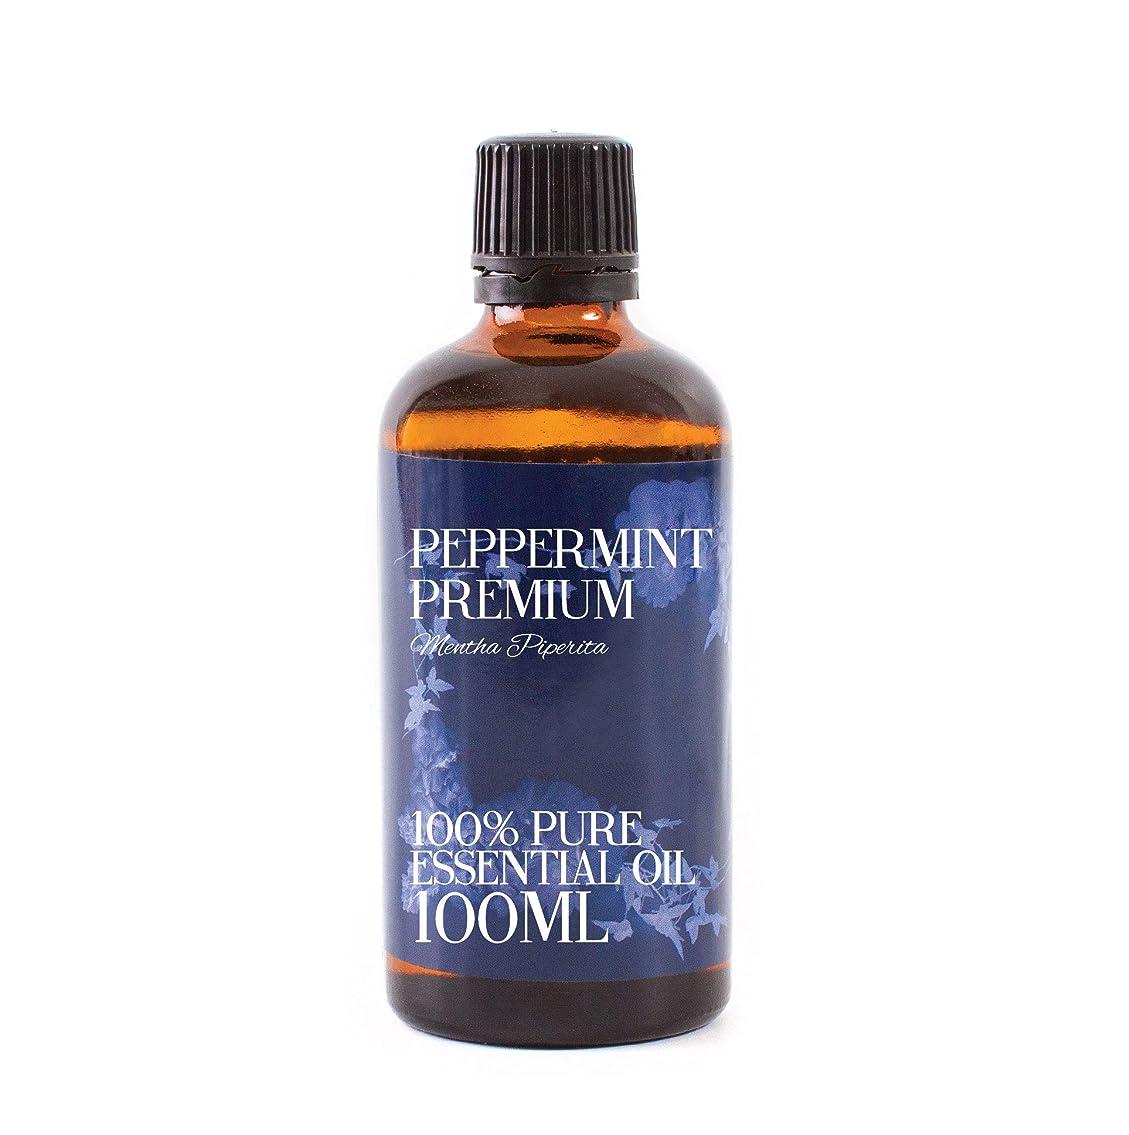 Mystic Moments | Peppermint Premium Essential Oil - 100ml - 100% Pure